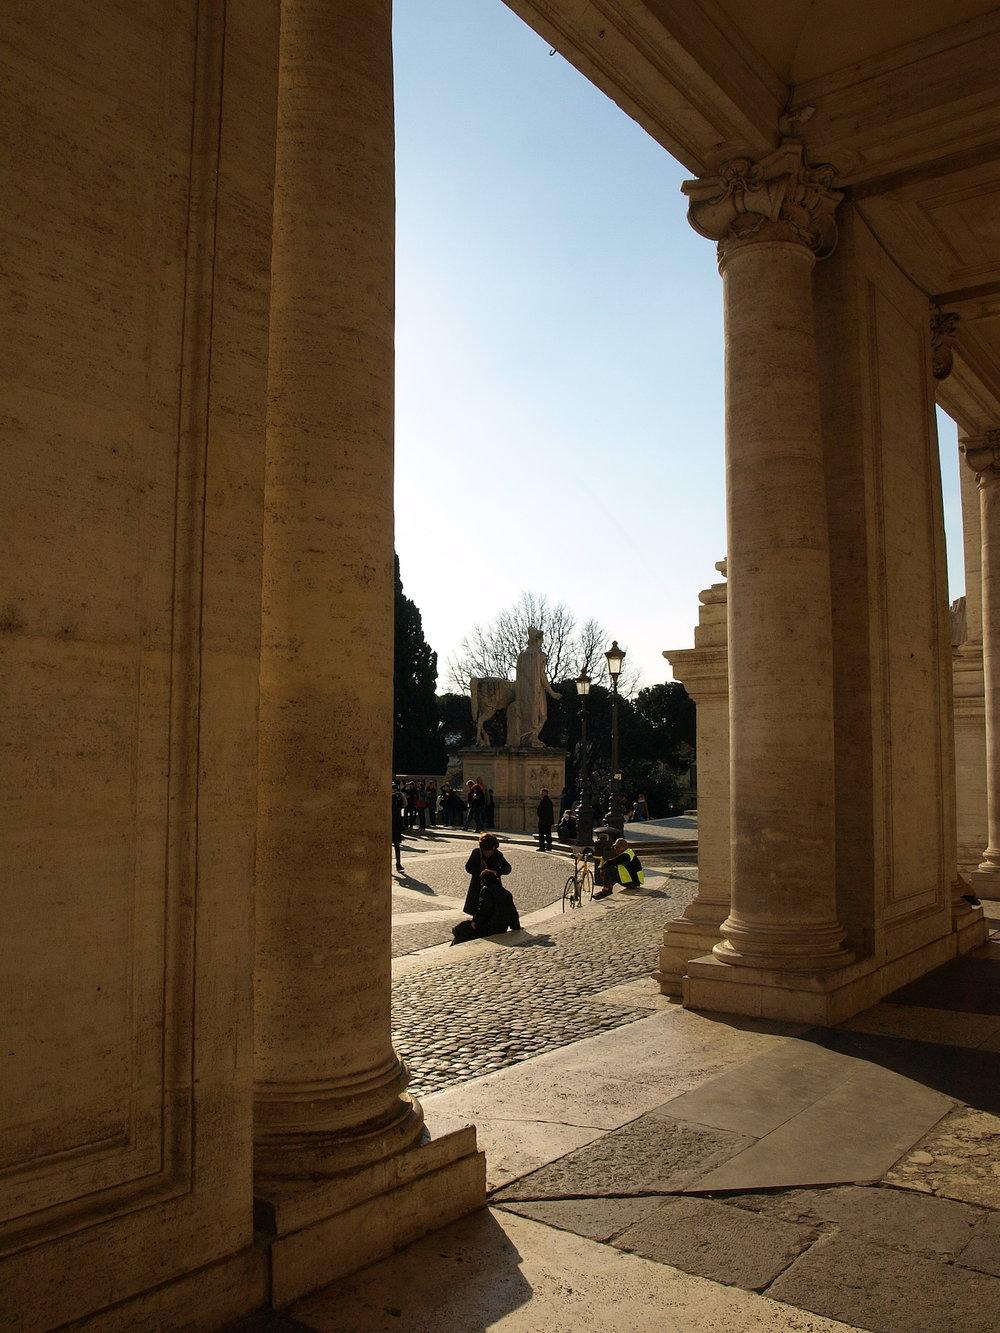 Piazza del Campidoglio  / Geena Matuson @geenamatuson #thegirlmirage